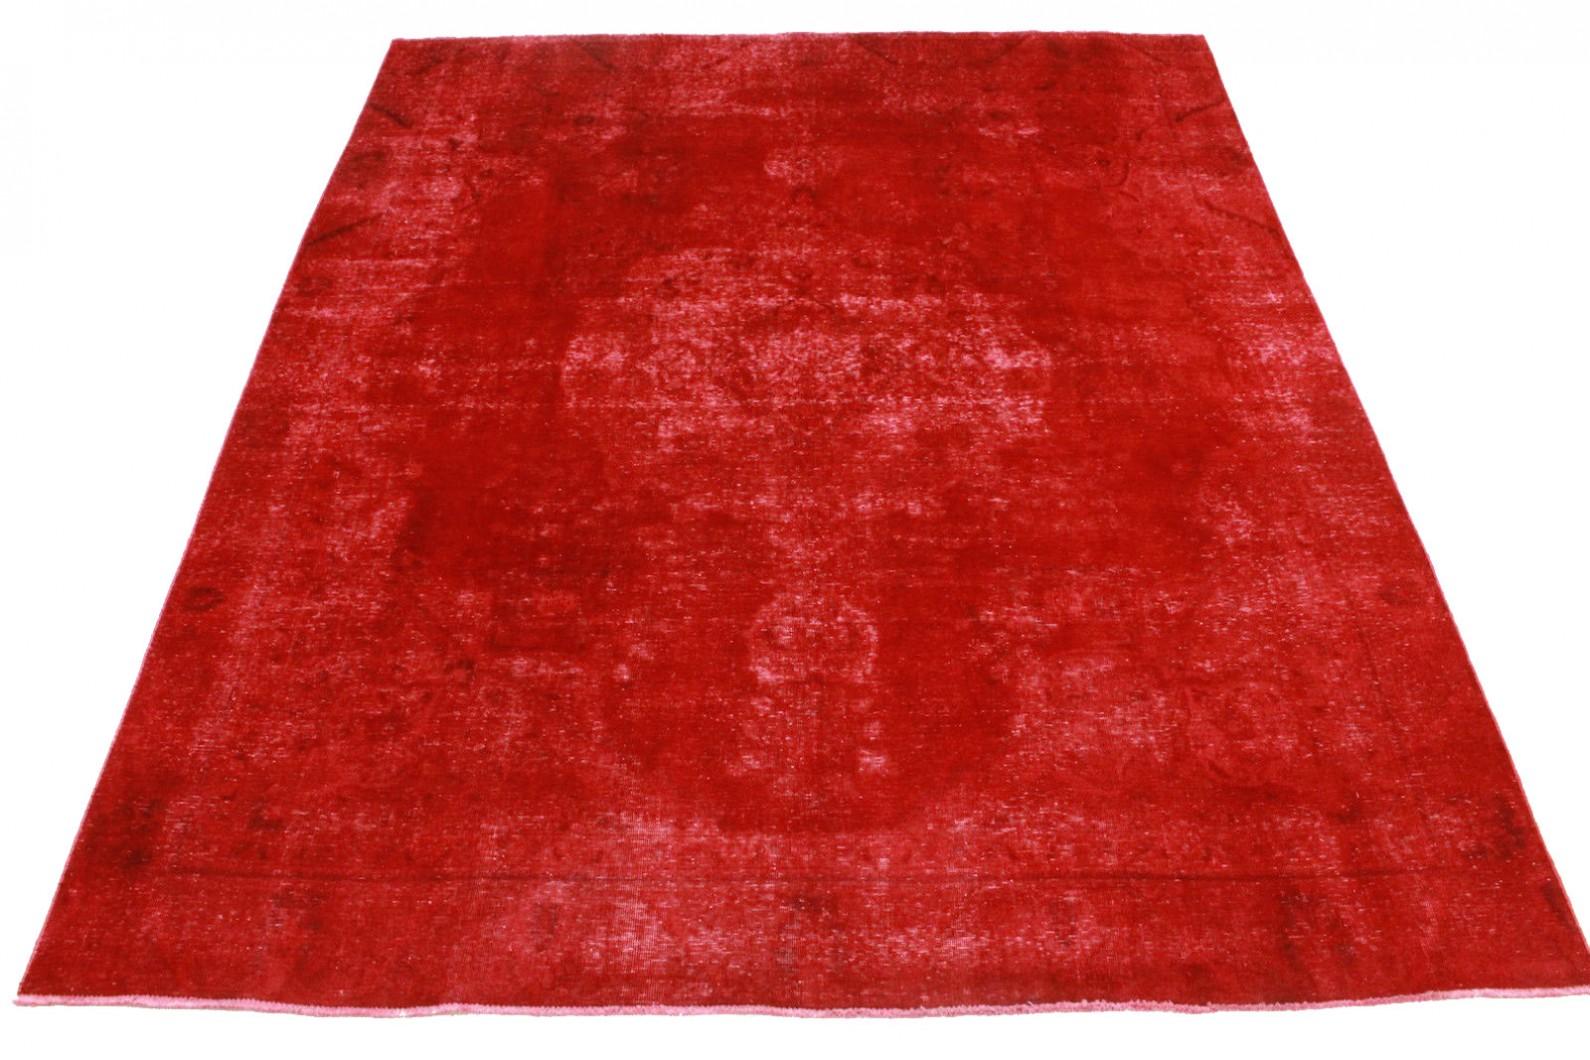 Vintage Teppich Rot in 360x290cm (1 / 11)